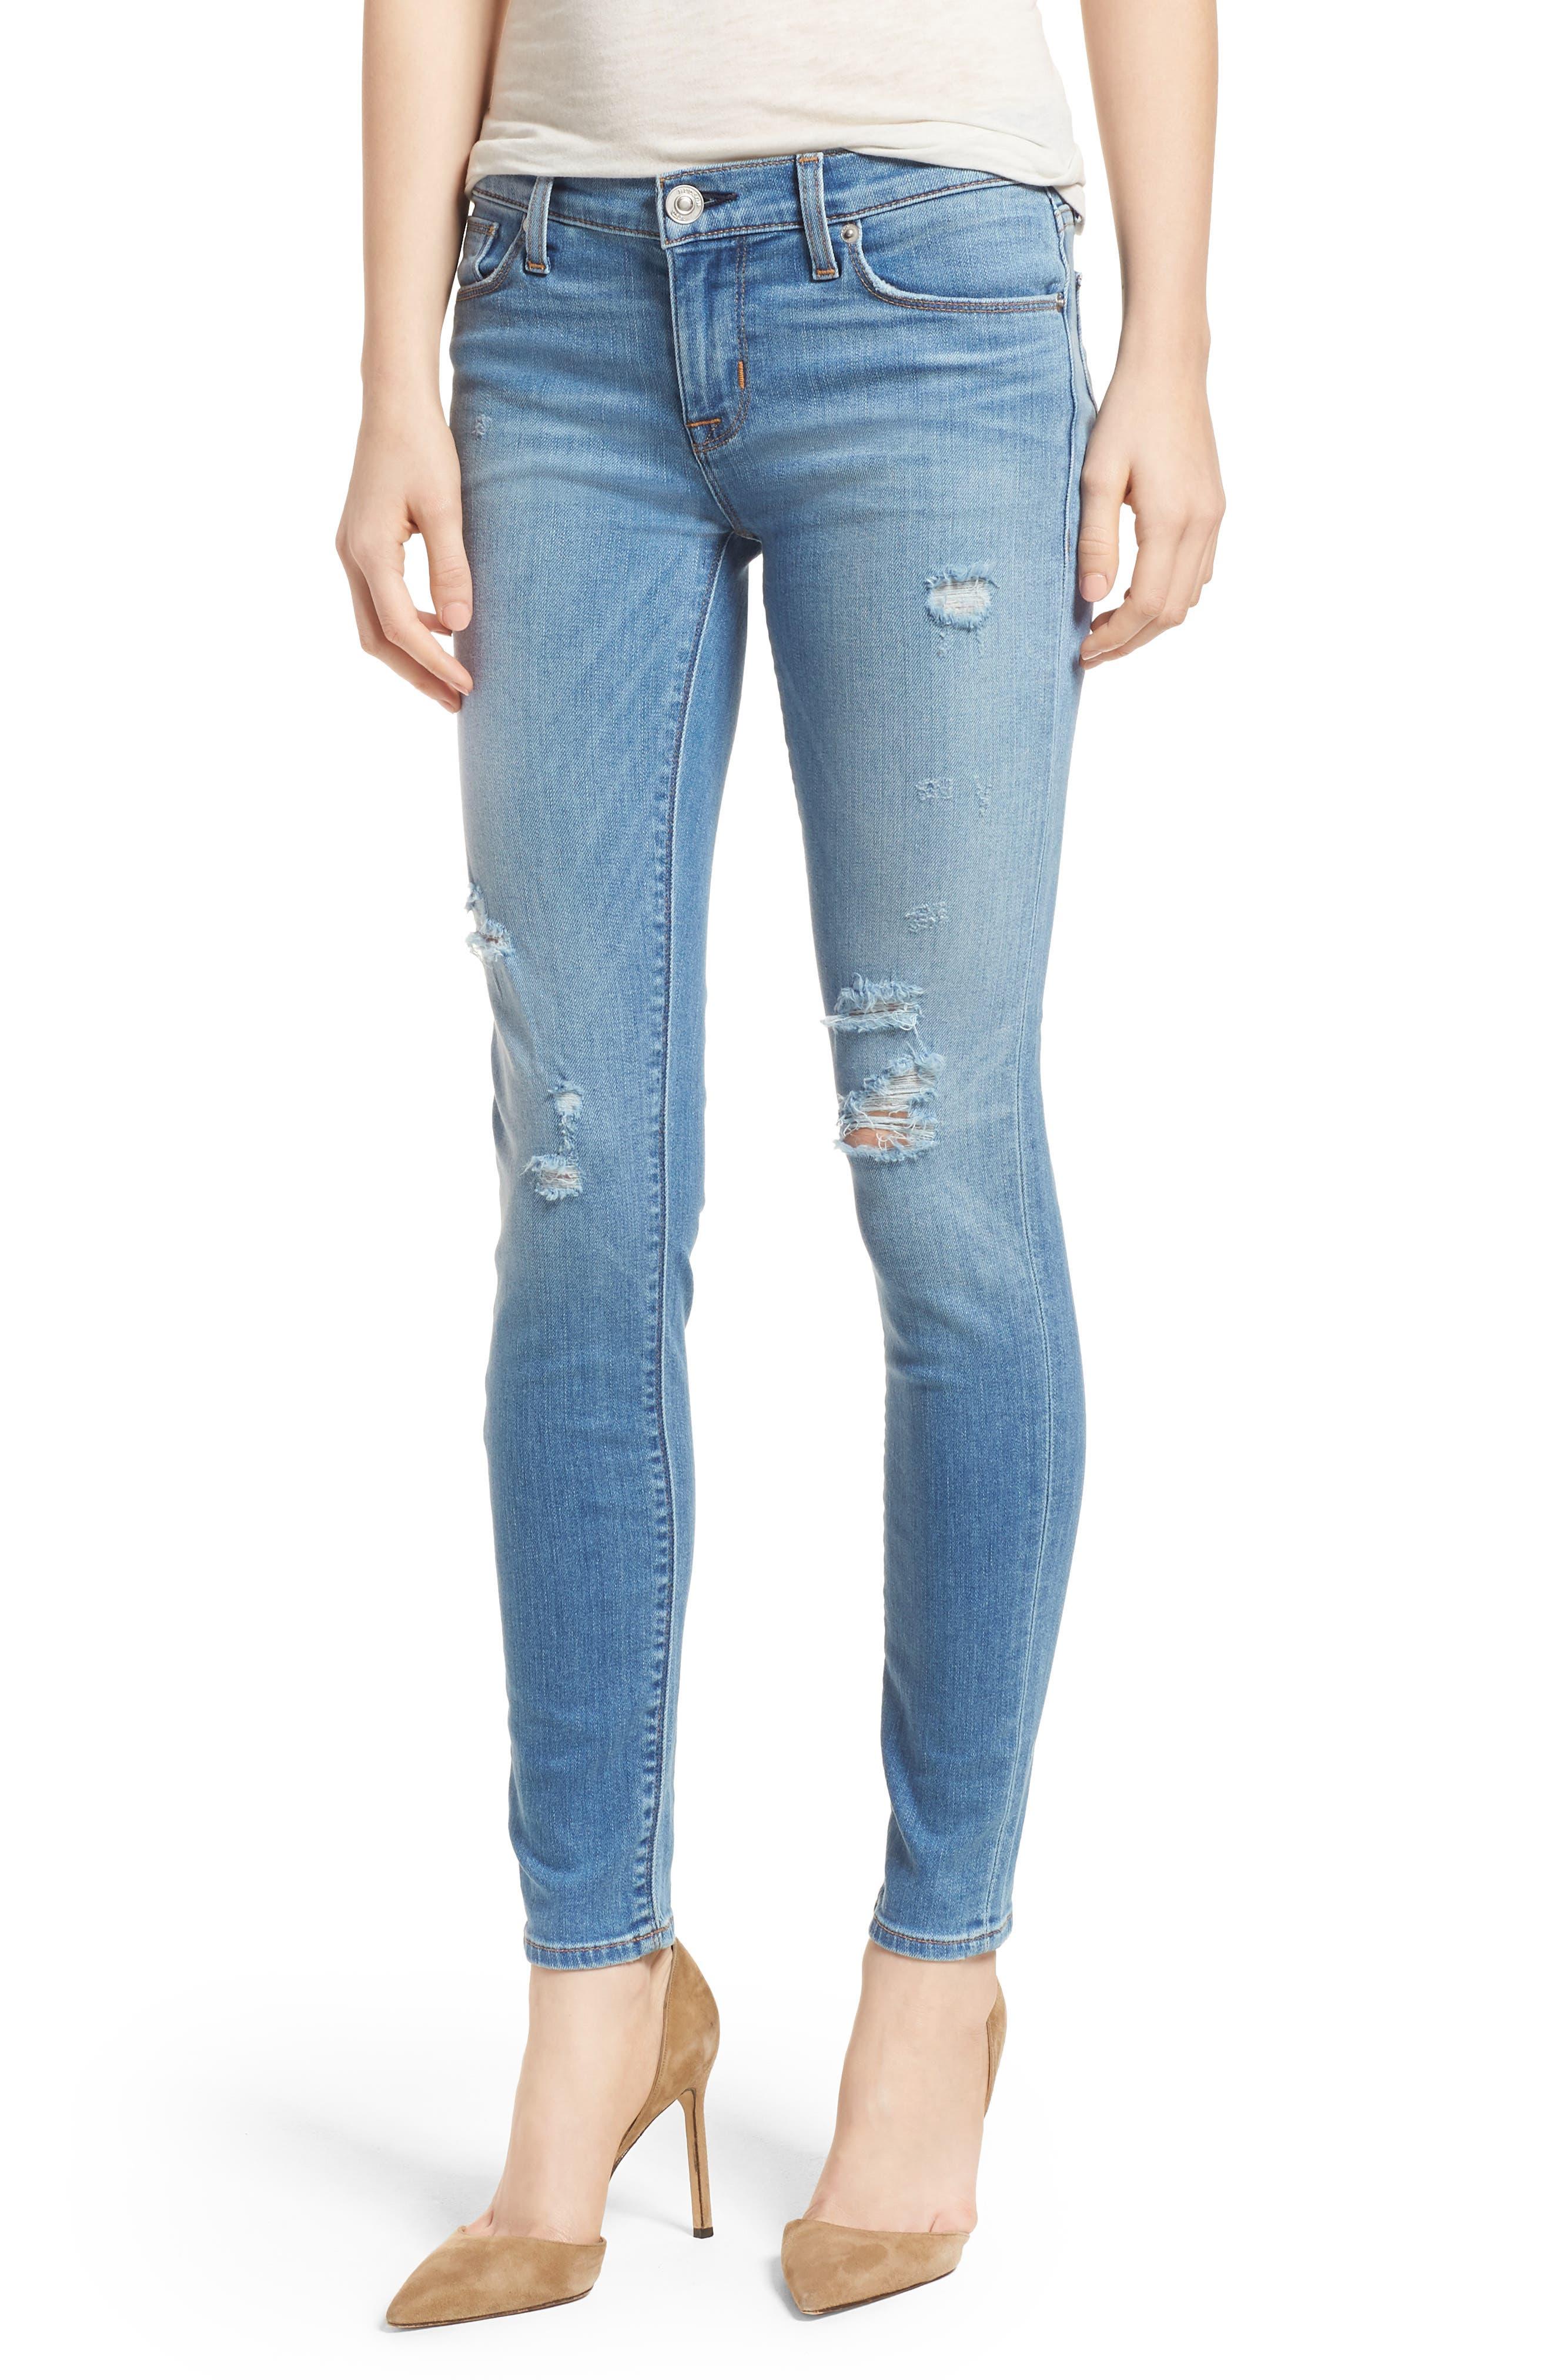 Alternate Image 1 Selected - Hudson Jeans Krista Ankle Super Skinny Jeans (No Tears)